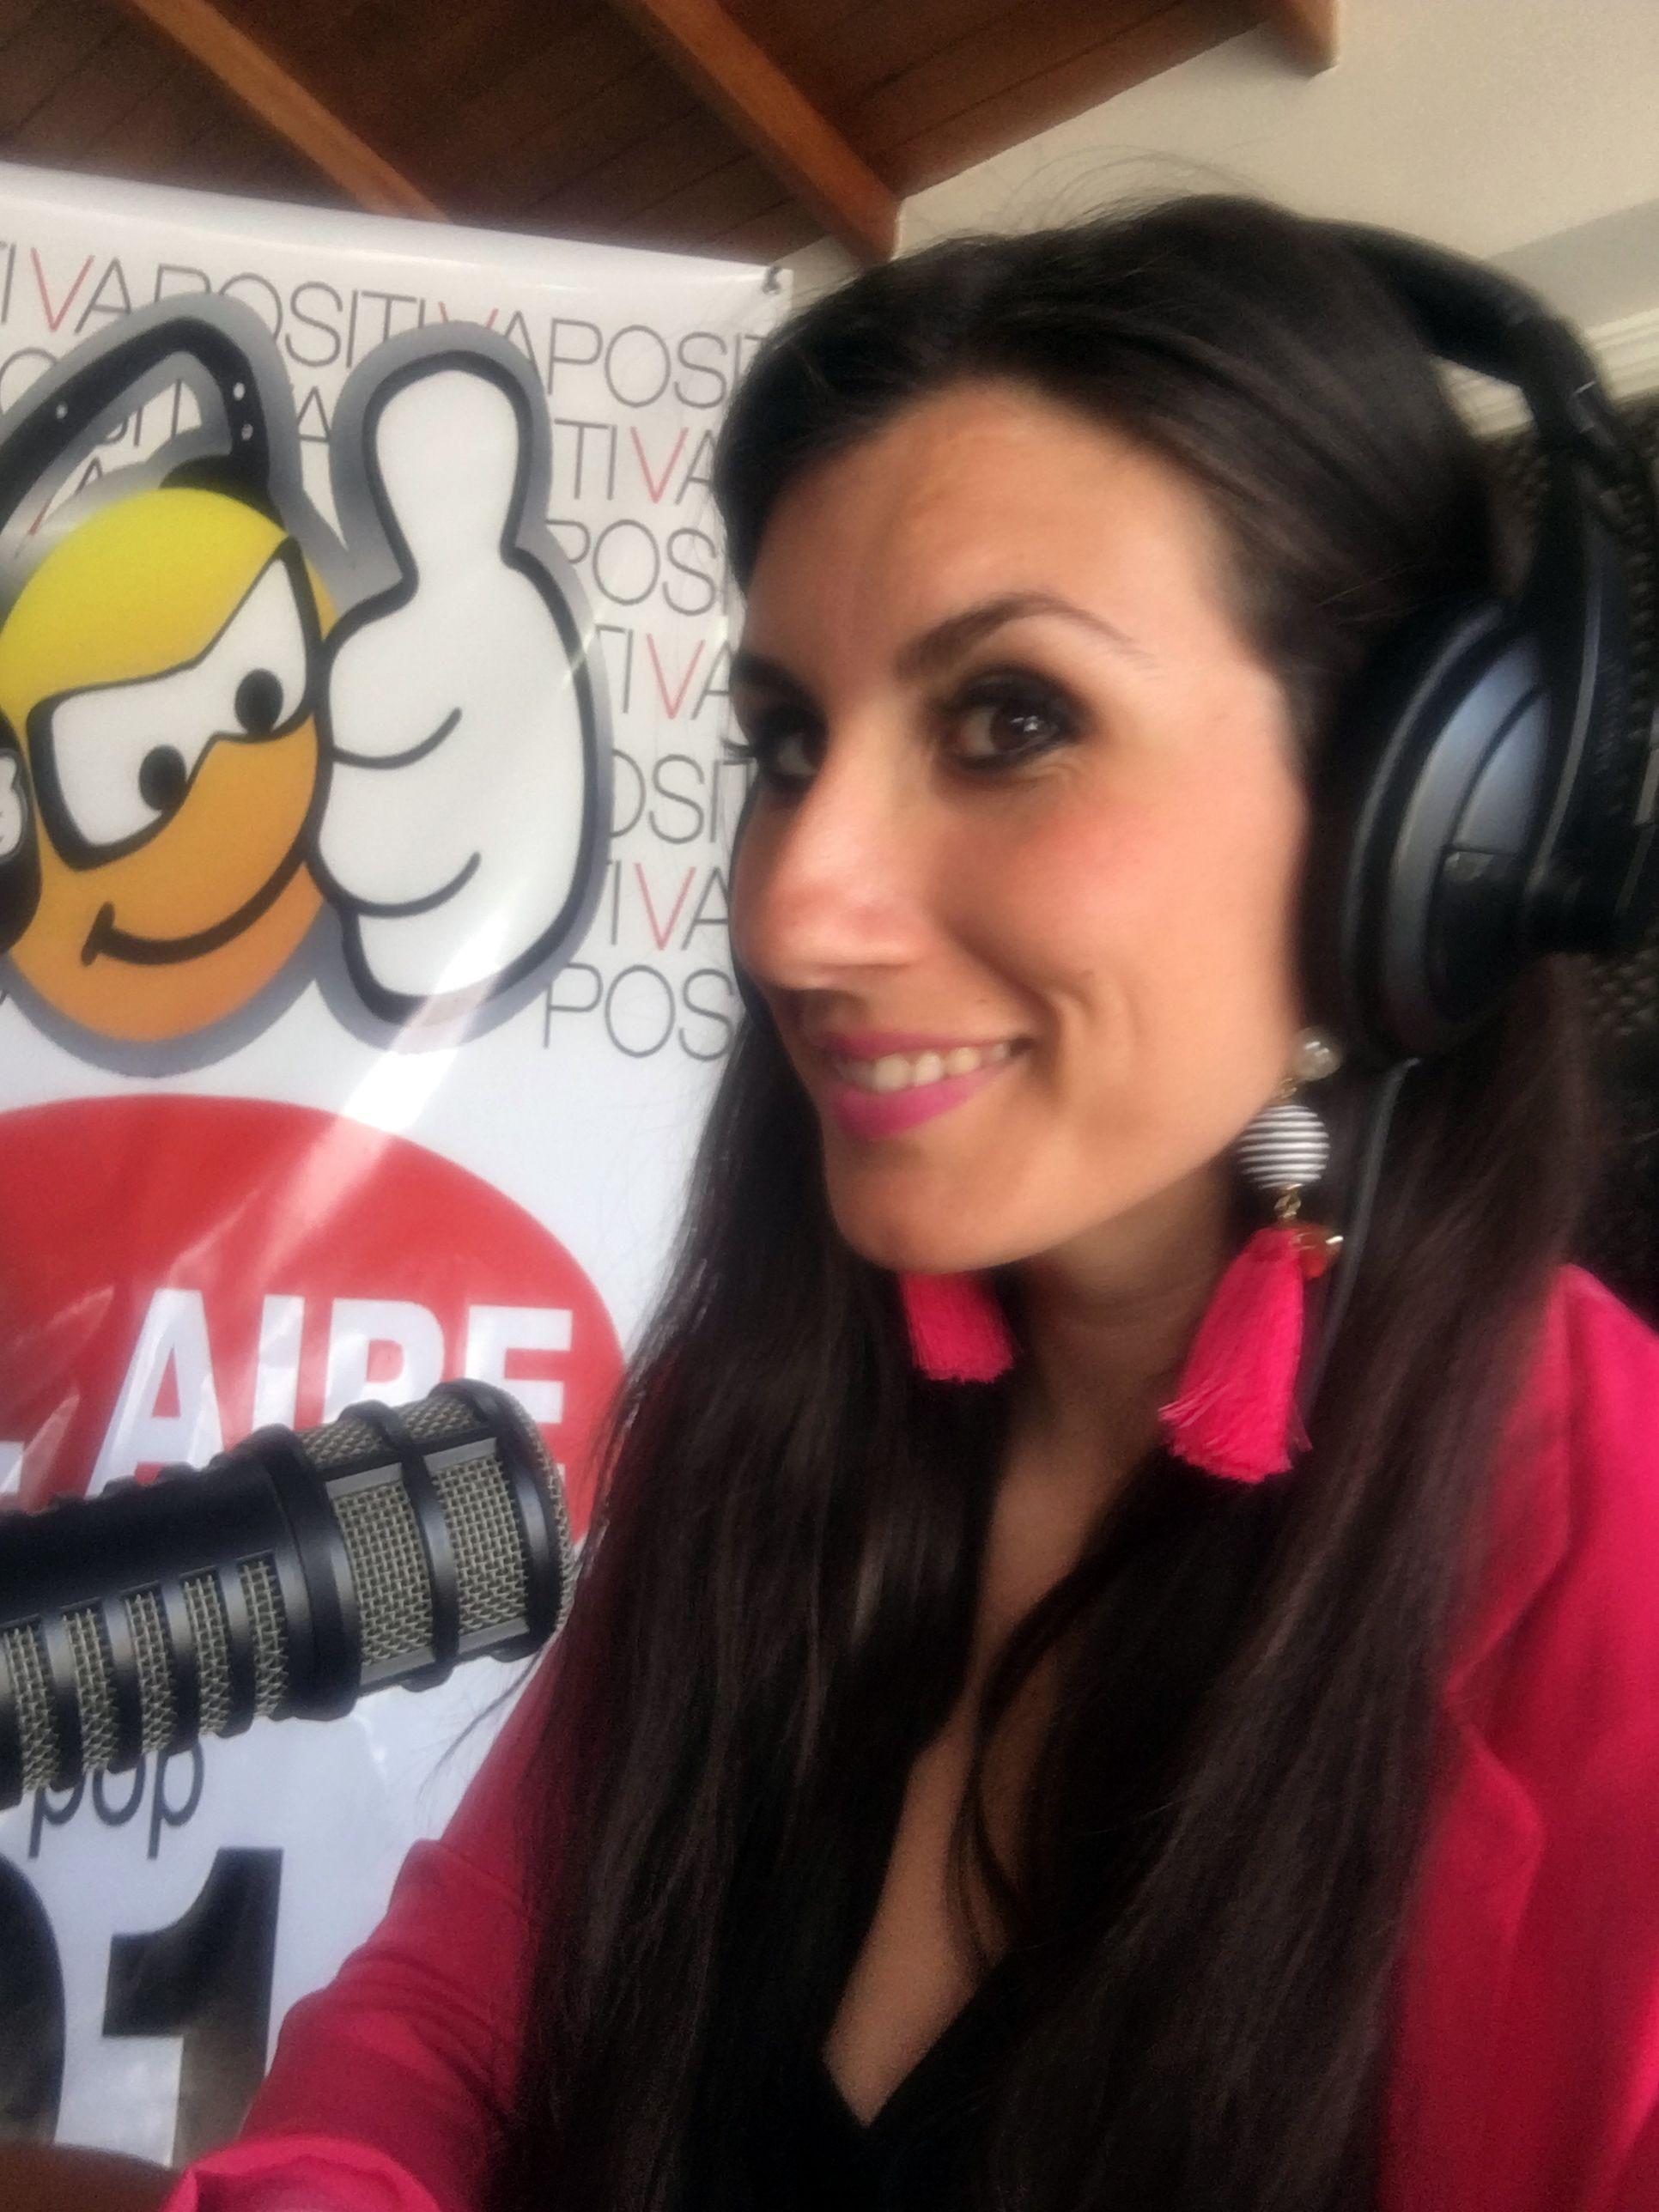 Prensa colombia - Ana Jmnez